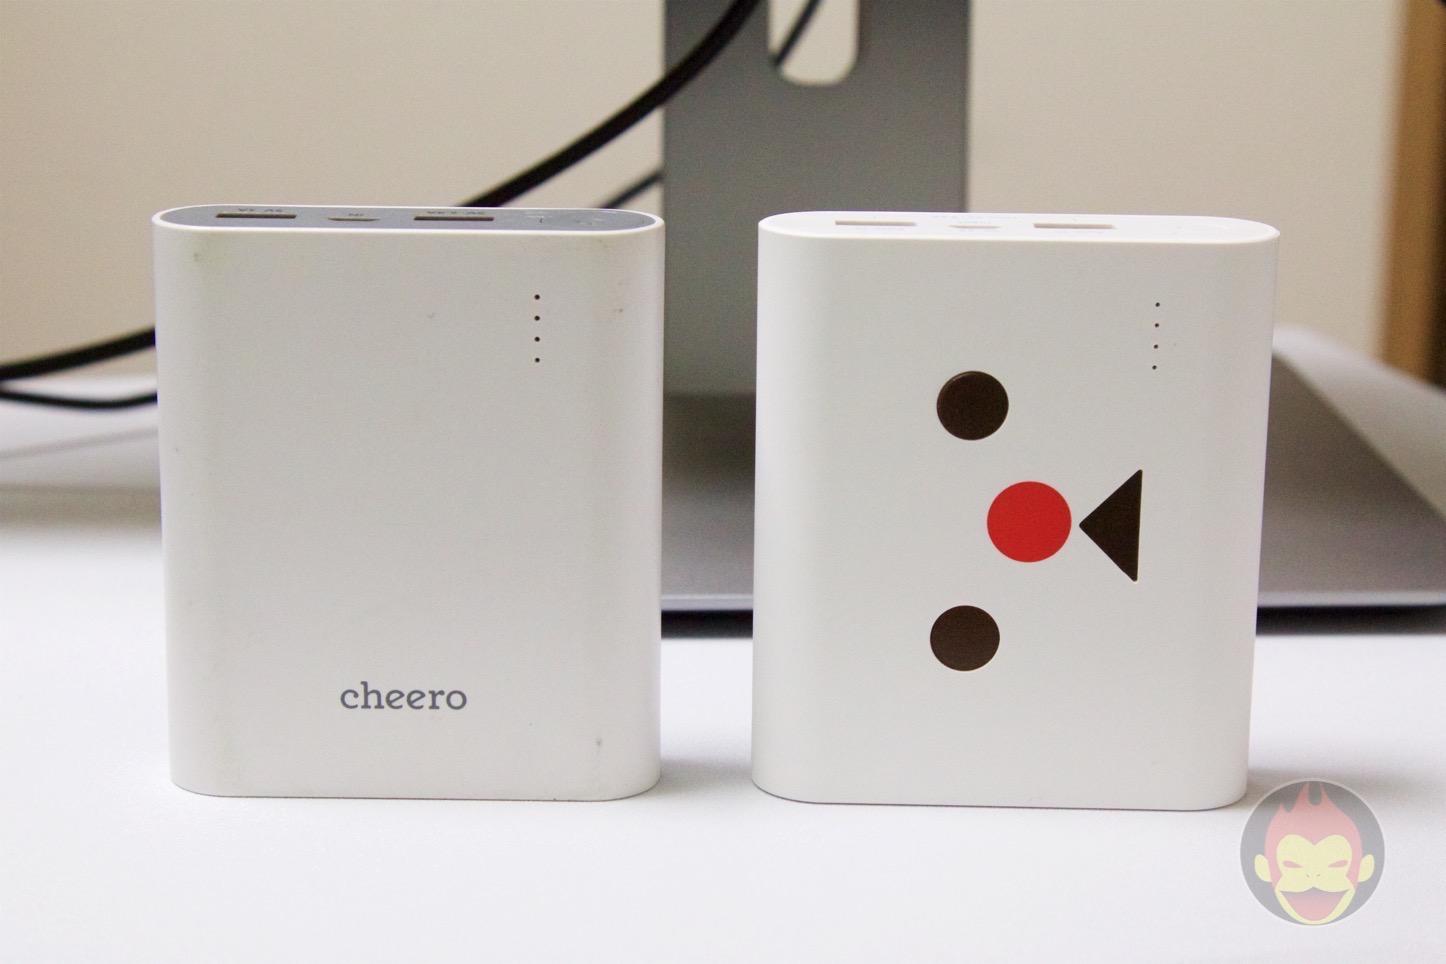 cheero-Powerplus-3-DANBOARD-Version-Snowman-08.jpg